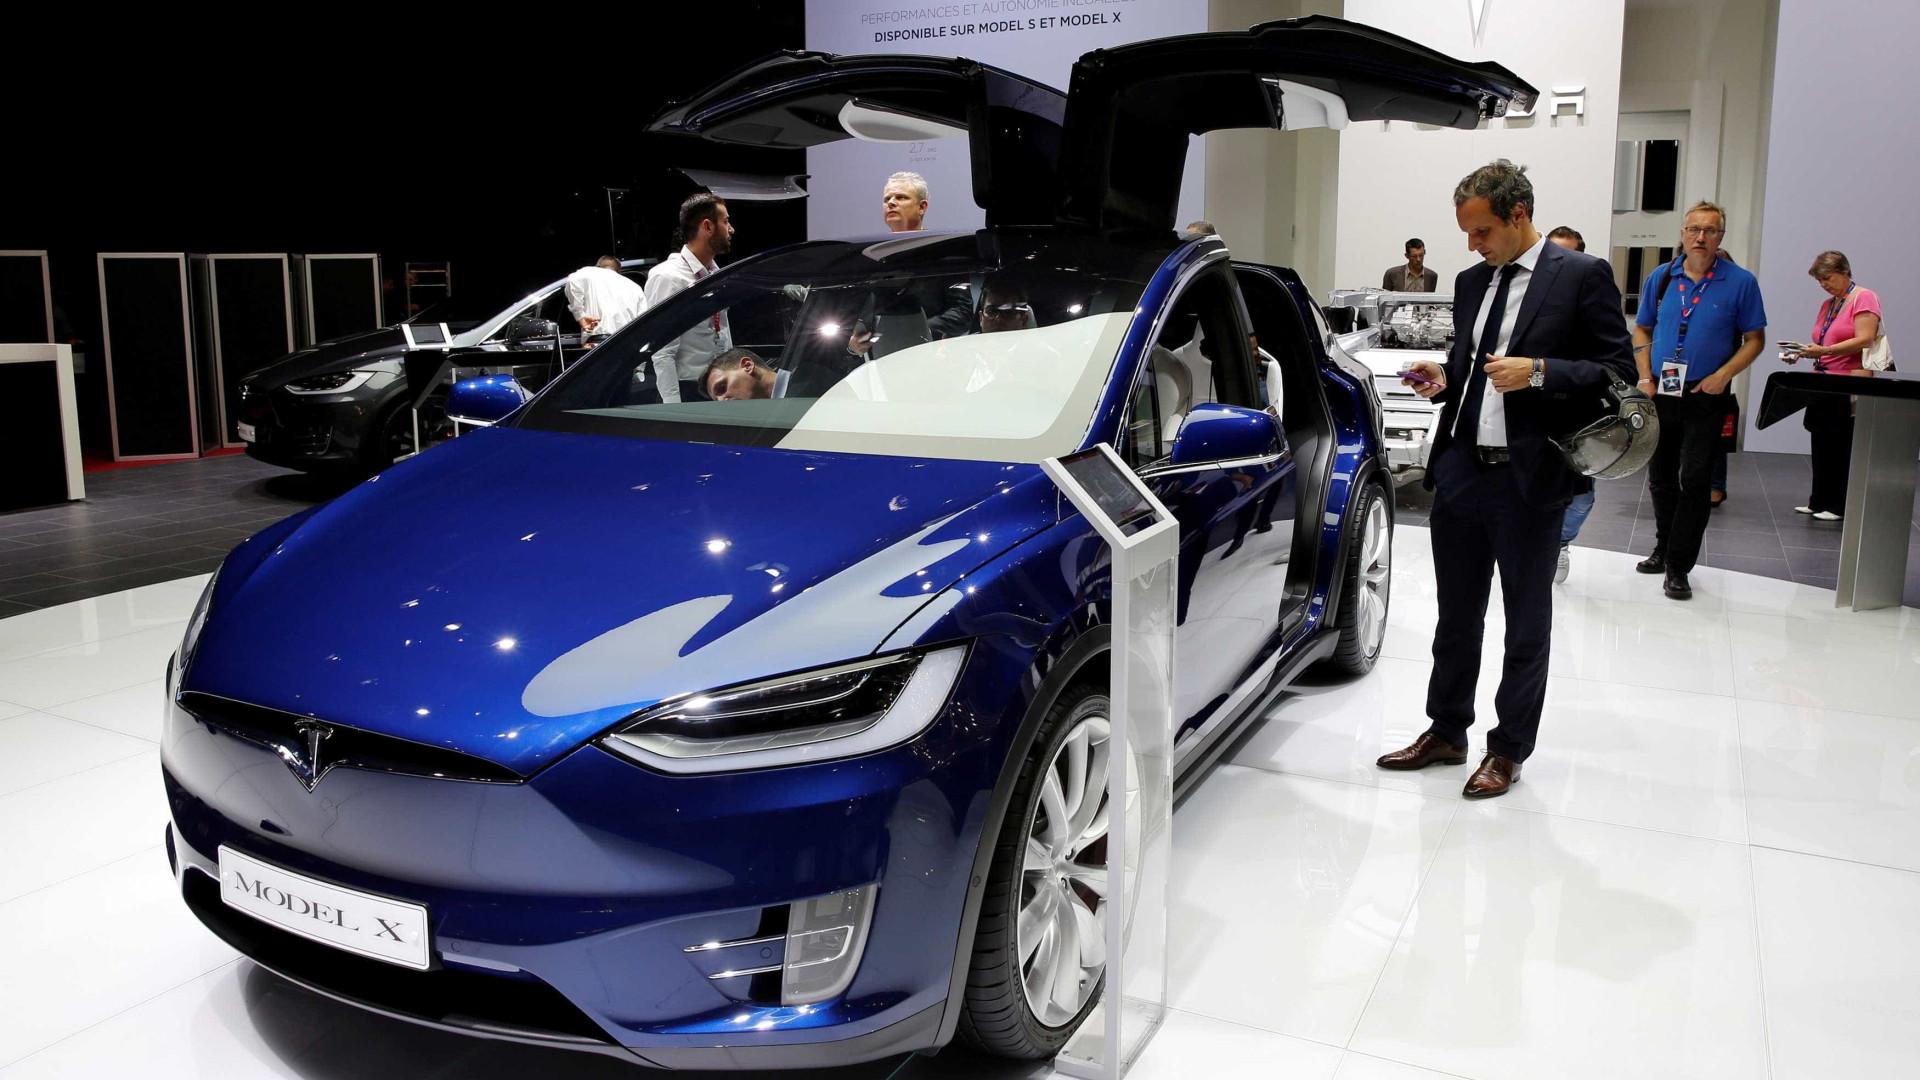 Torres Vedras entra na corrida pela fábrica da Tesla